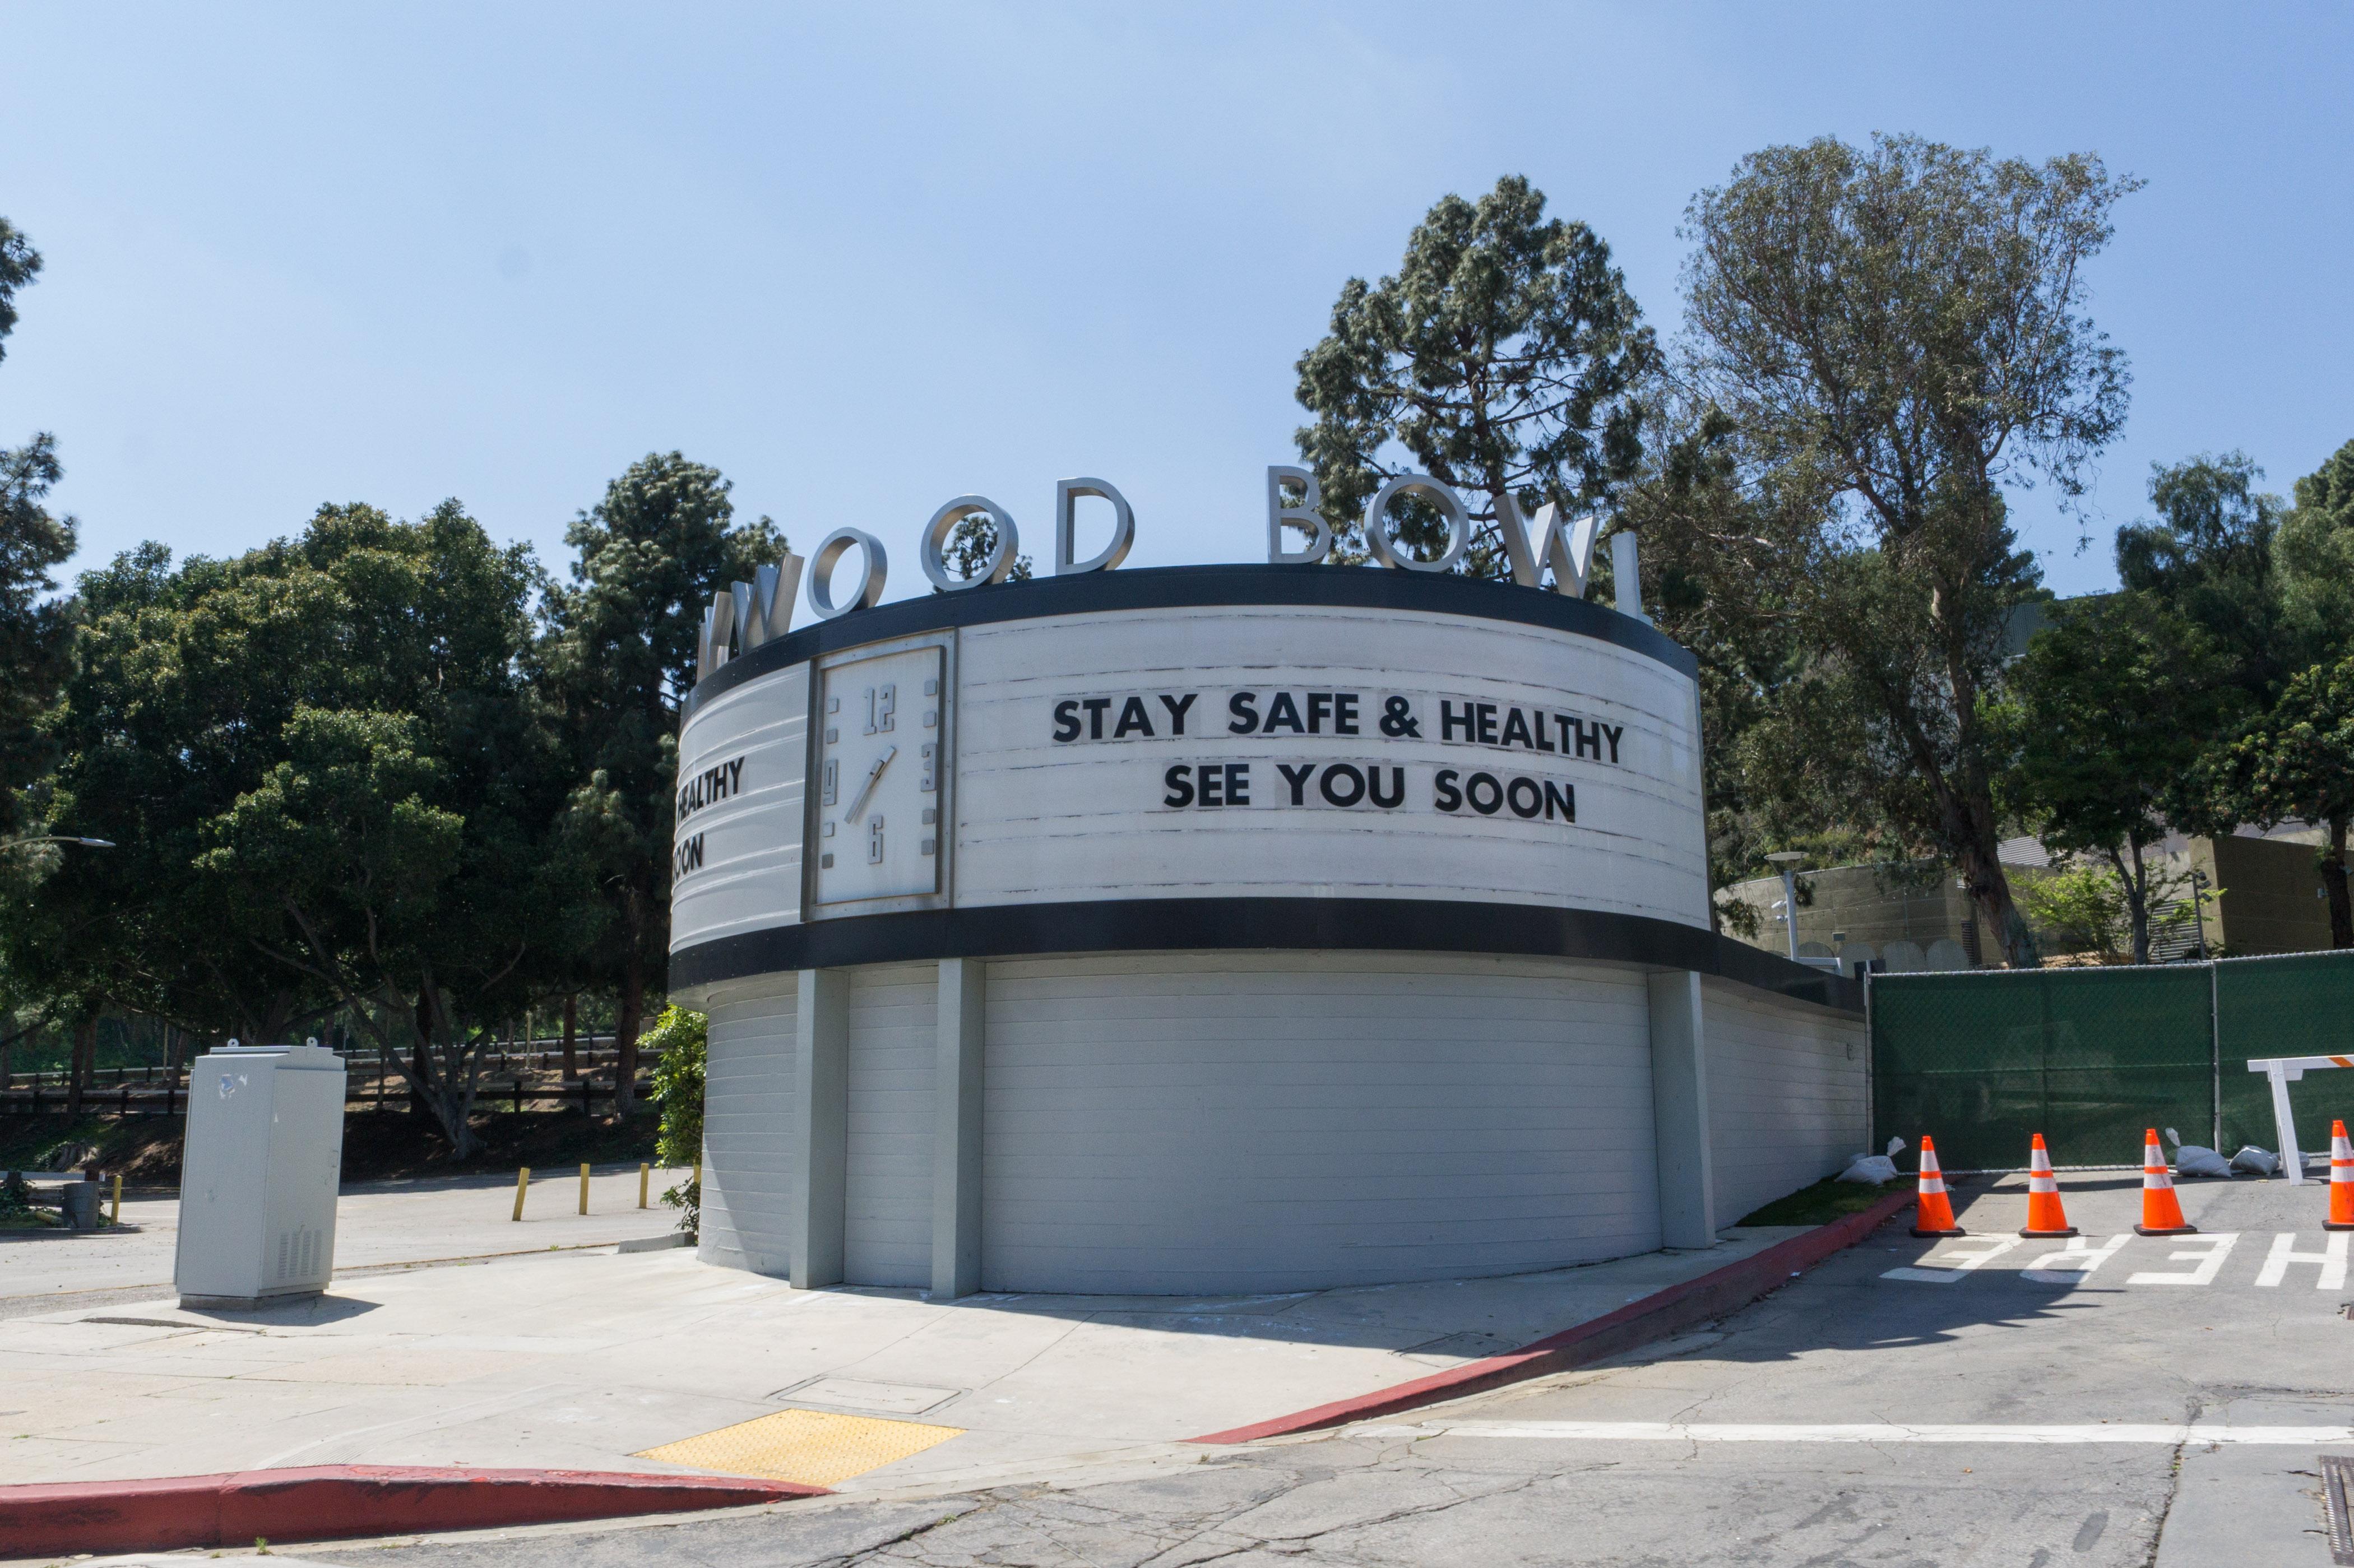 Hollywood Bowl Calendar 2022.Hollywood Bowl Unveils Summer Lineup Cynthia Erivo H E R More Deadline